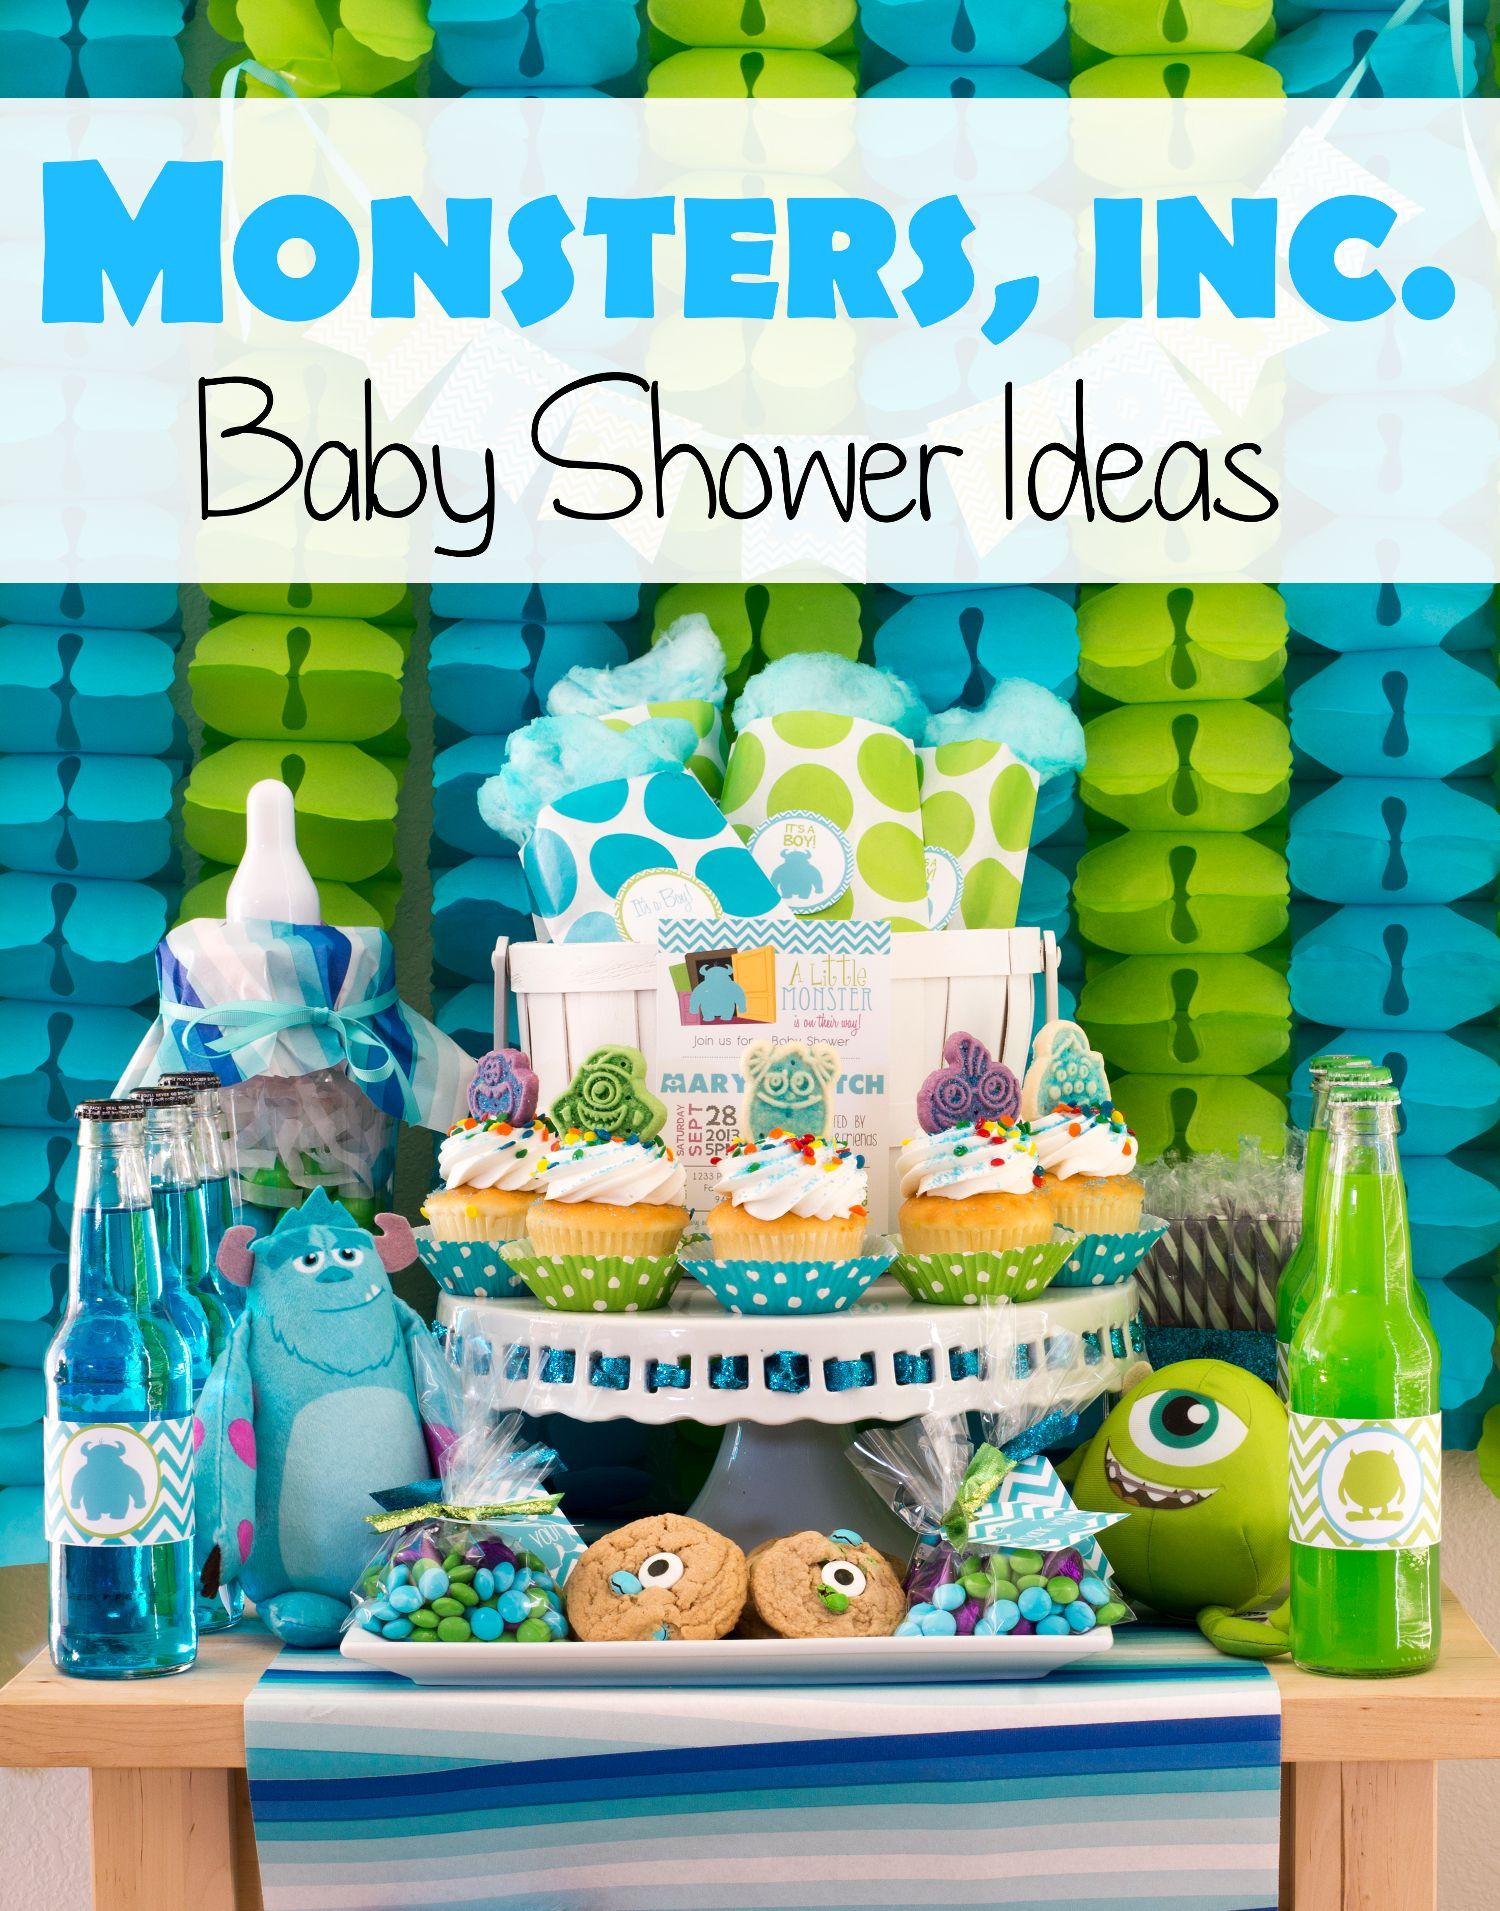 Monsters Inc Baby Shower Ideas Pinkducky Its A Boy